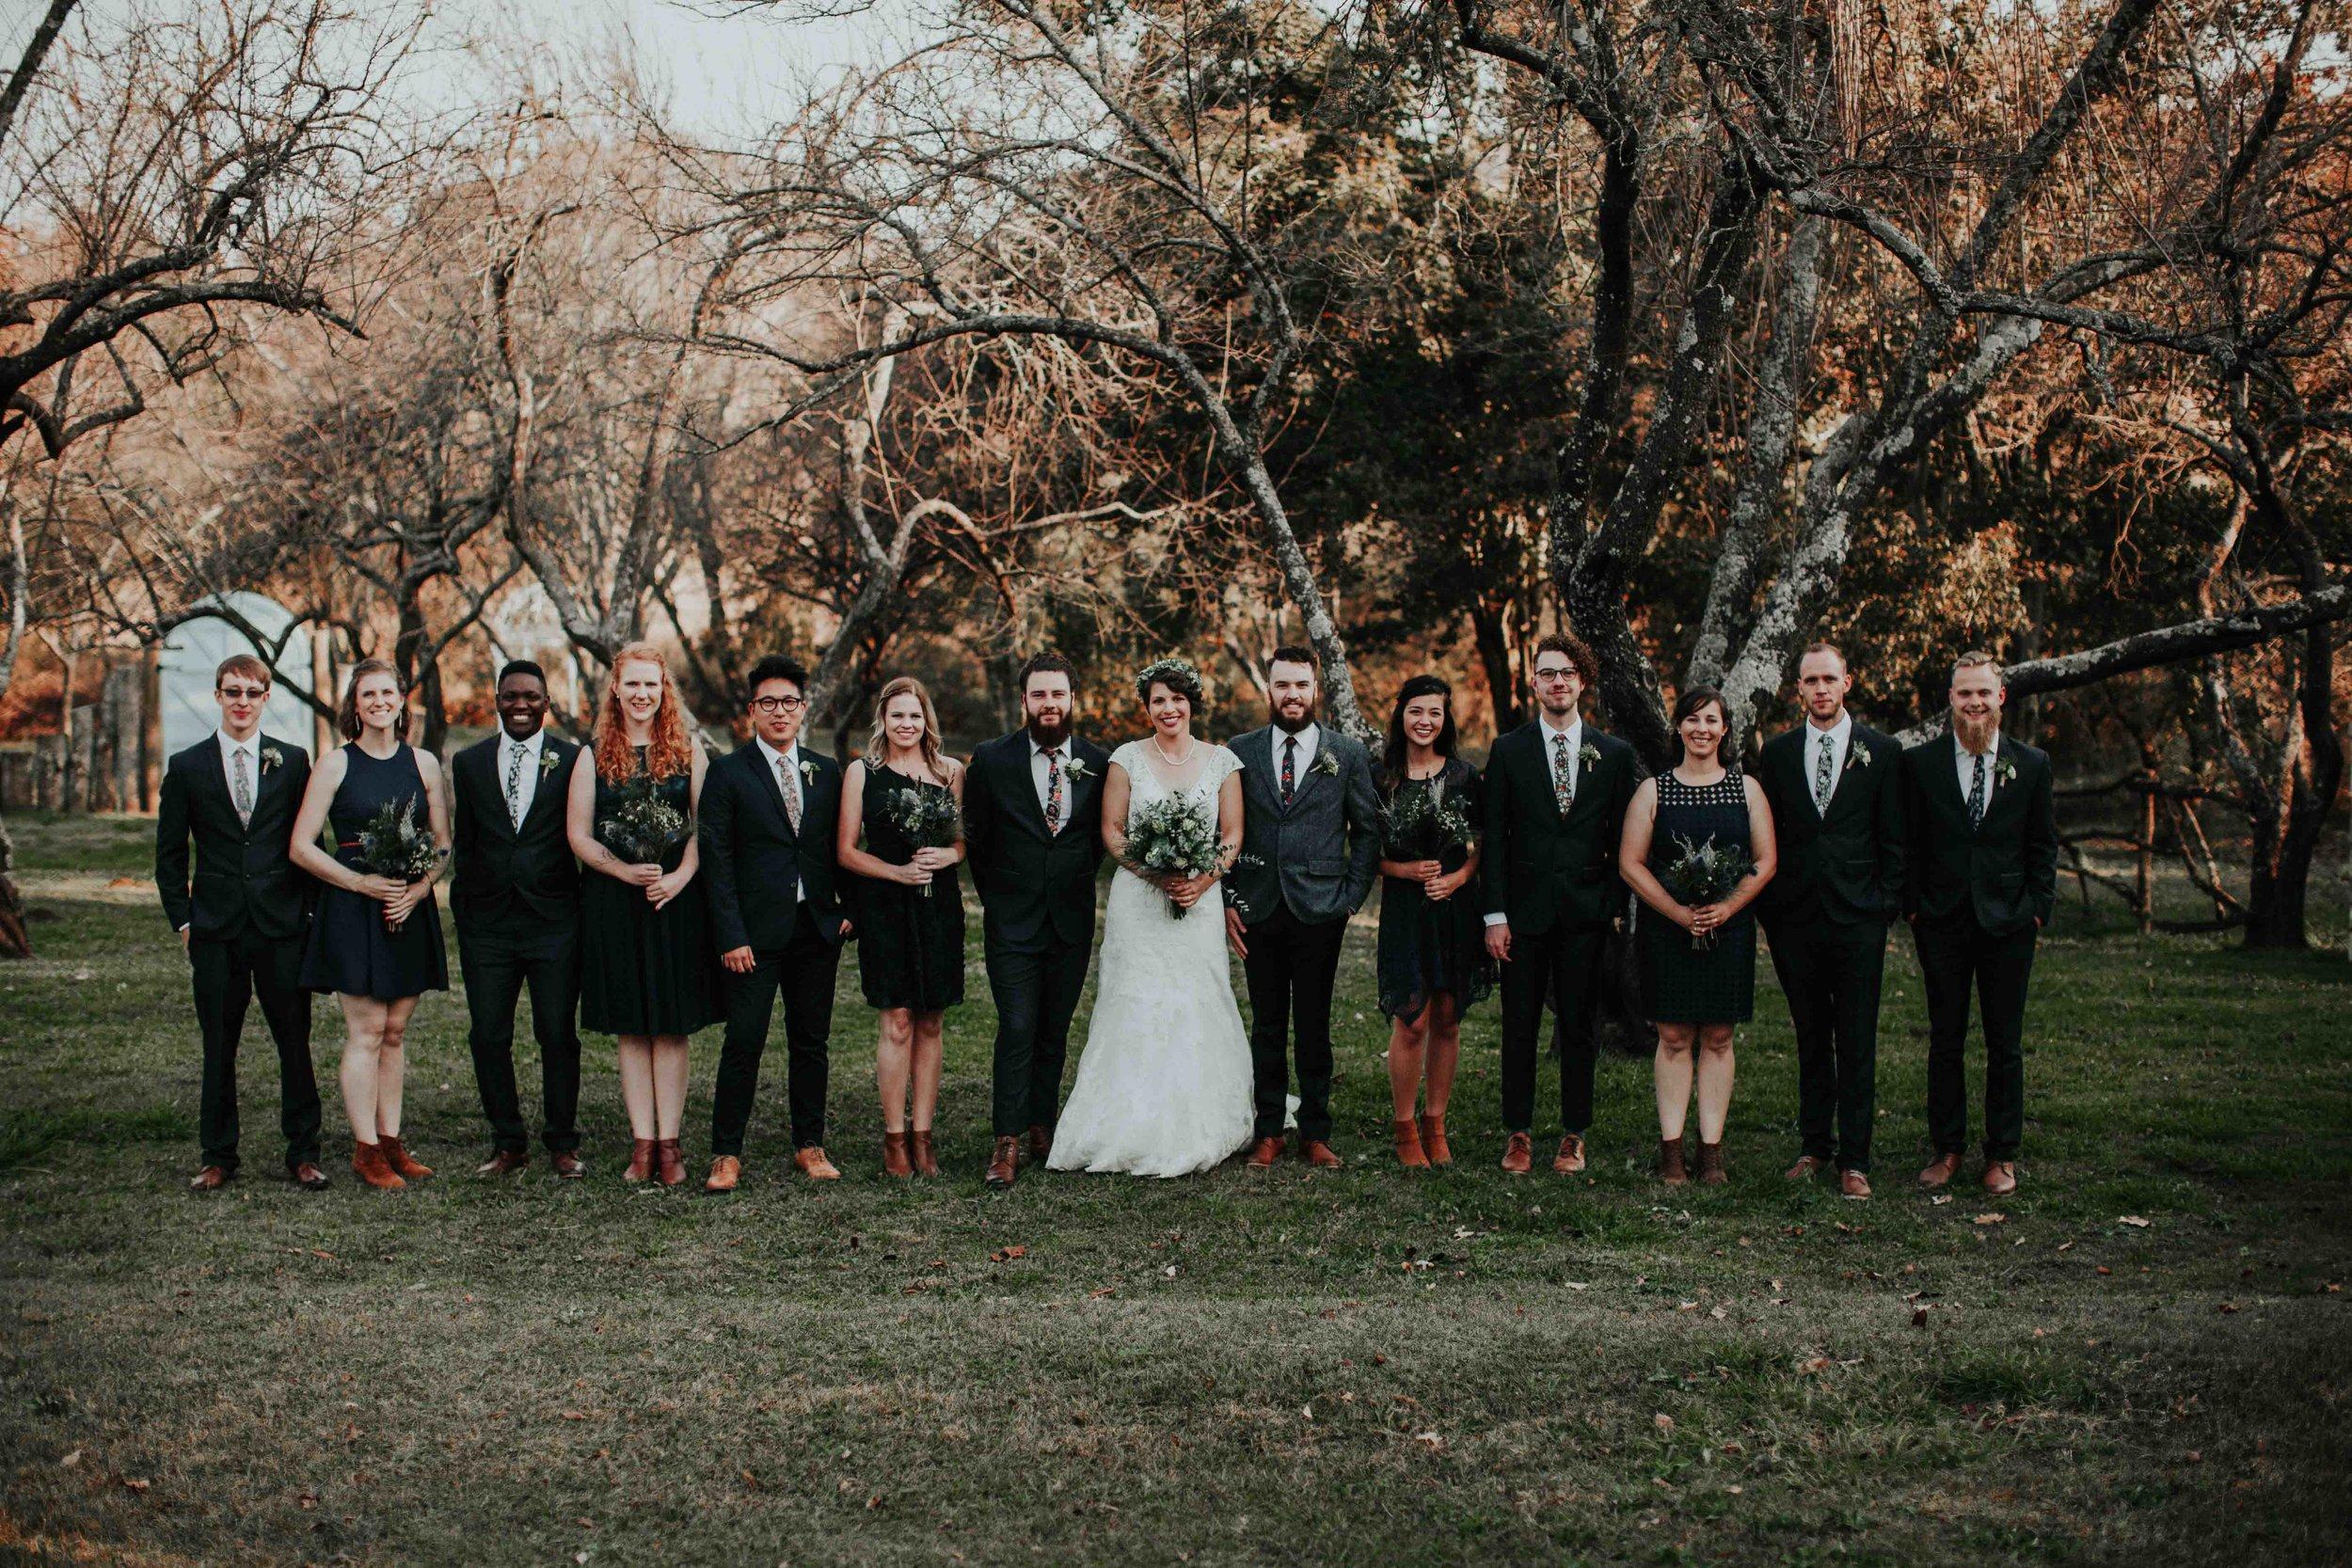 Kristi Smith Photography_Eloff&Jeanette_ Wedding Photographer 15.jpg